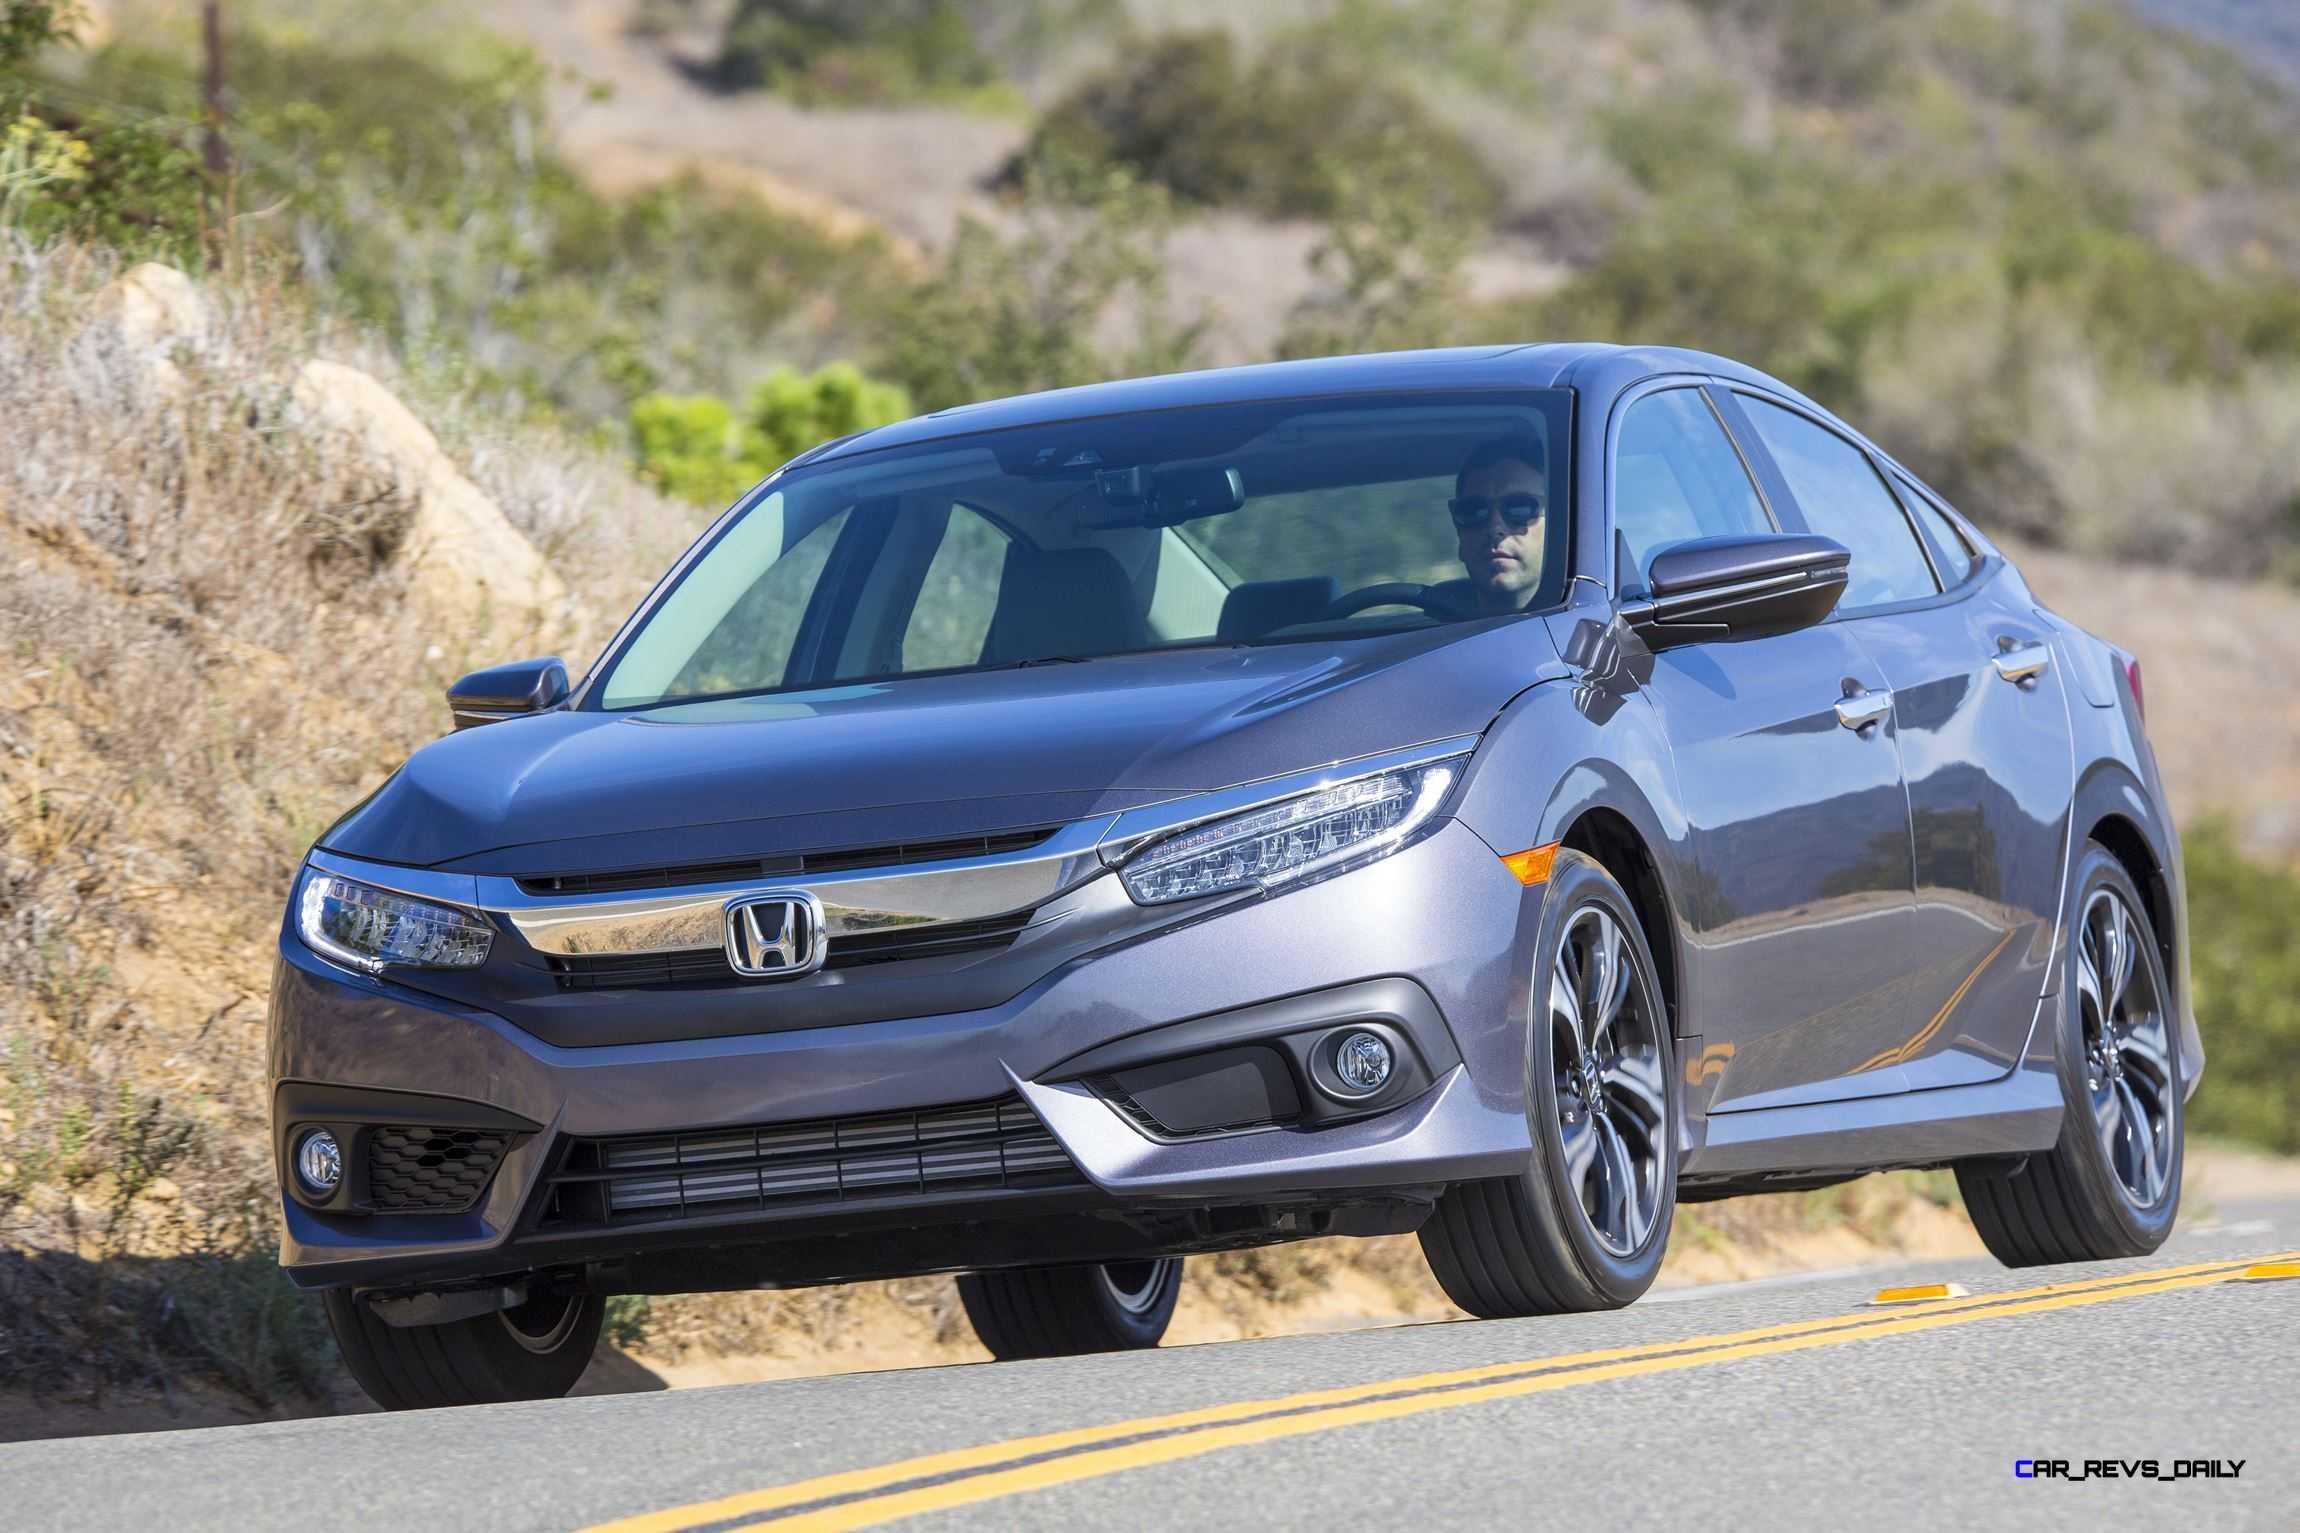 2016 honda civic sedan full tech specs 160 photos and for Honda civic 2016 dimensions